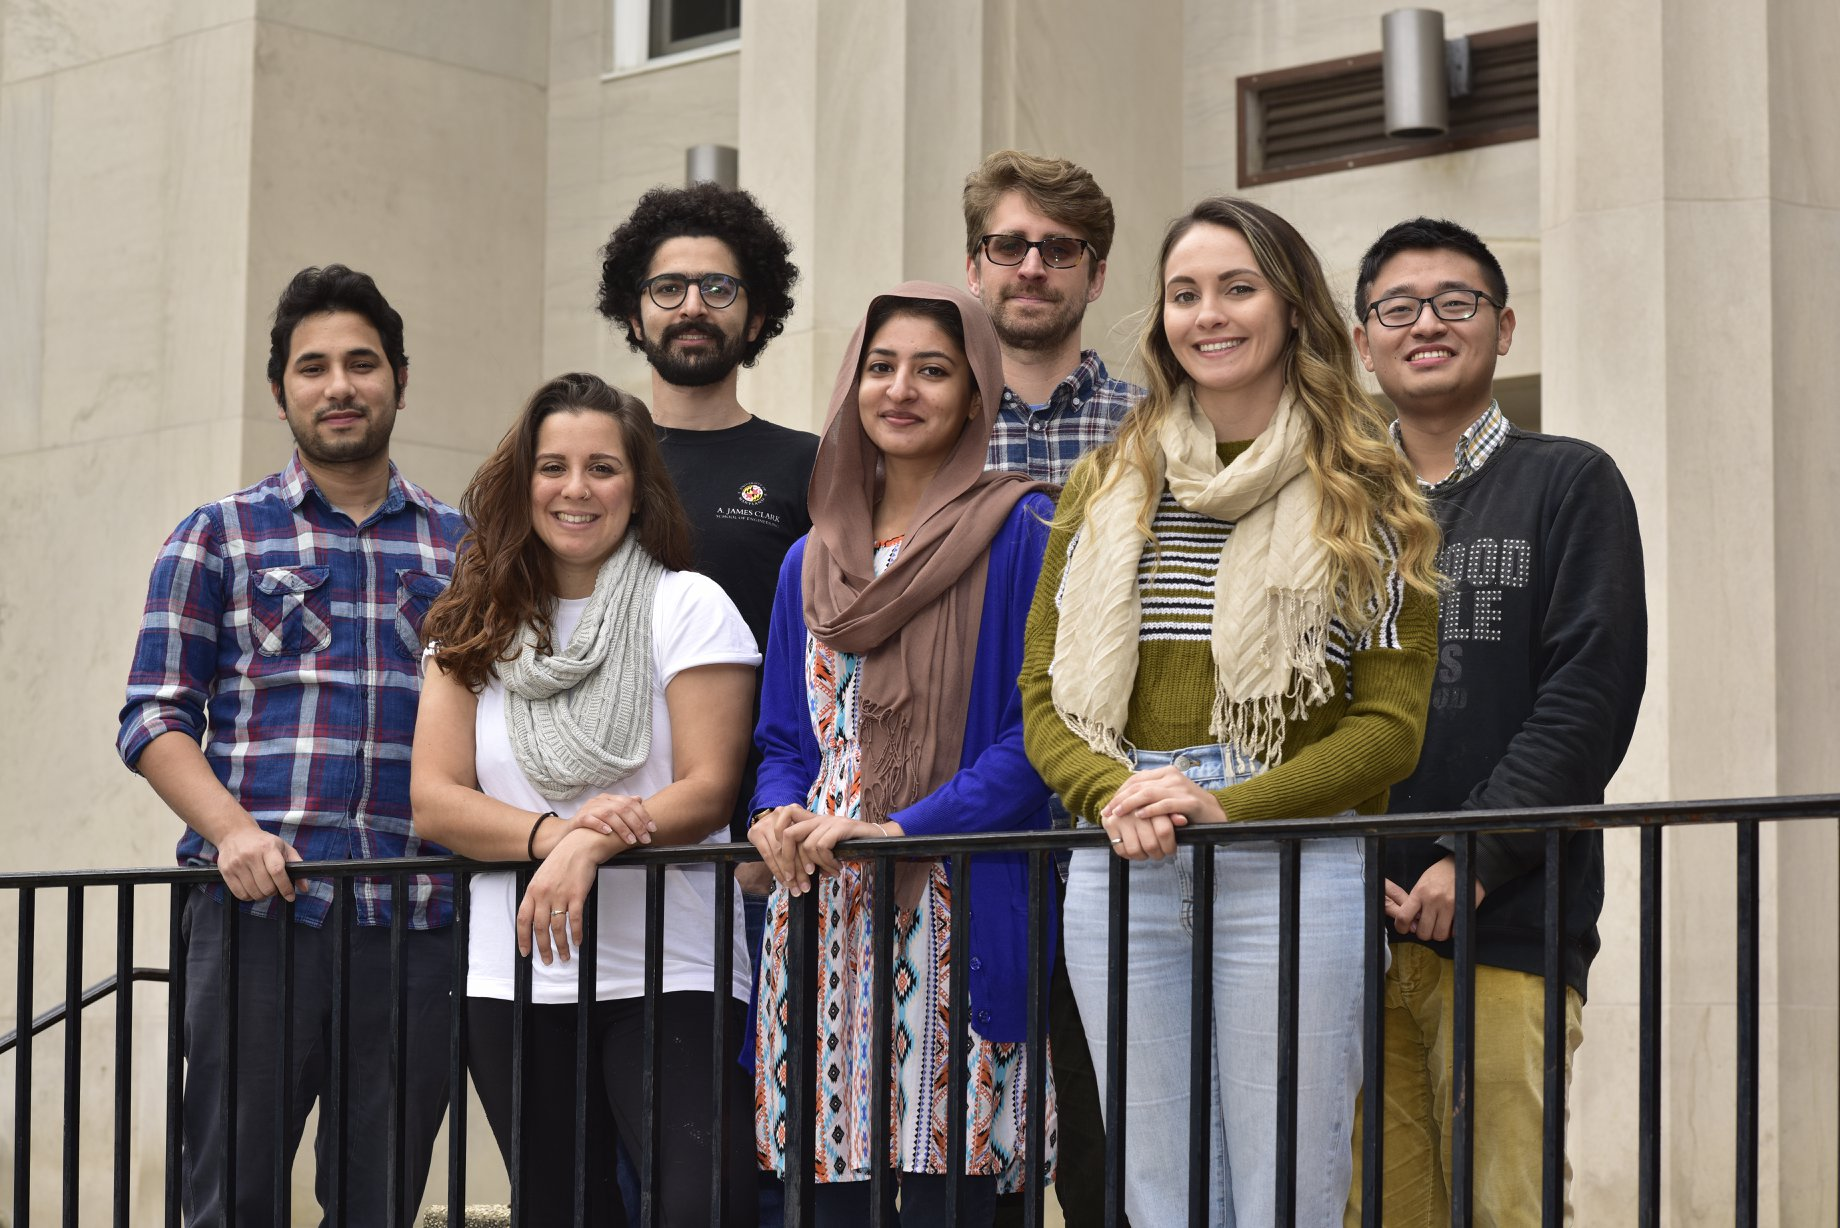 CEE Grad Student Council